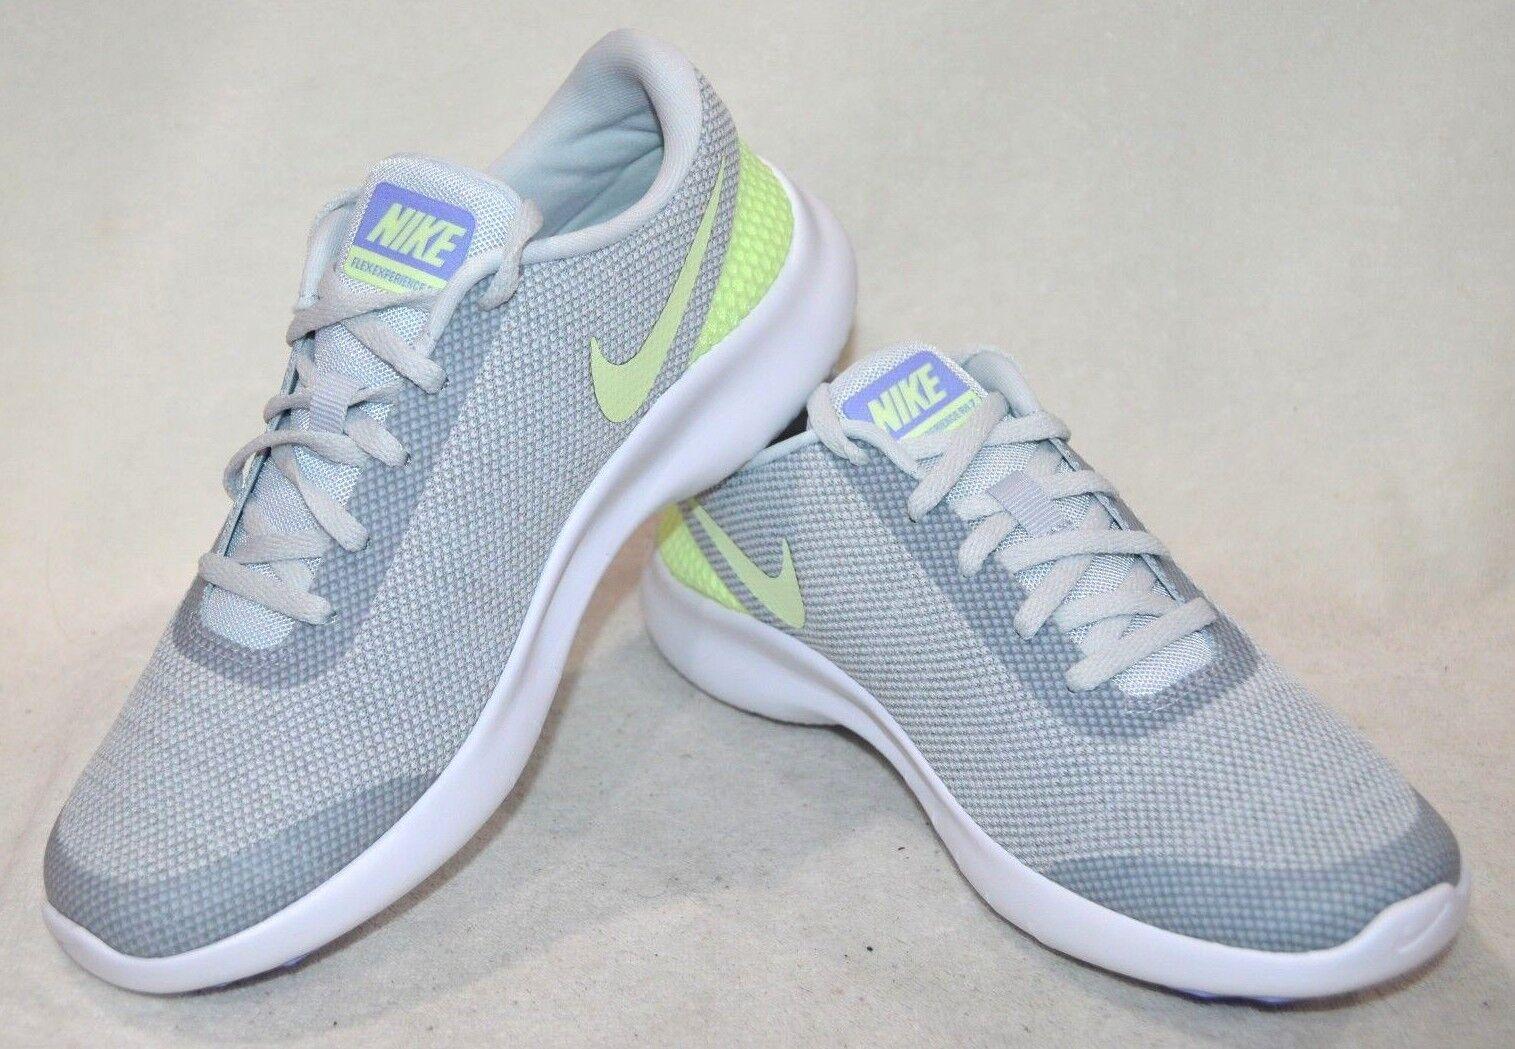 539f7336fe14b Nike Flex Experience RN 7 Women s Running Shoes Sz.10 US Platinum ...